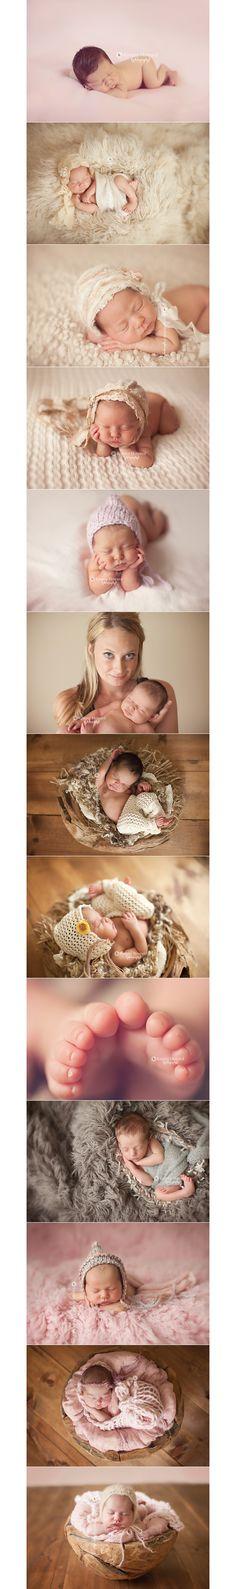 Kimmy Howard Photography Newborn Photography Inspiration